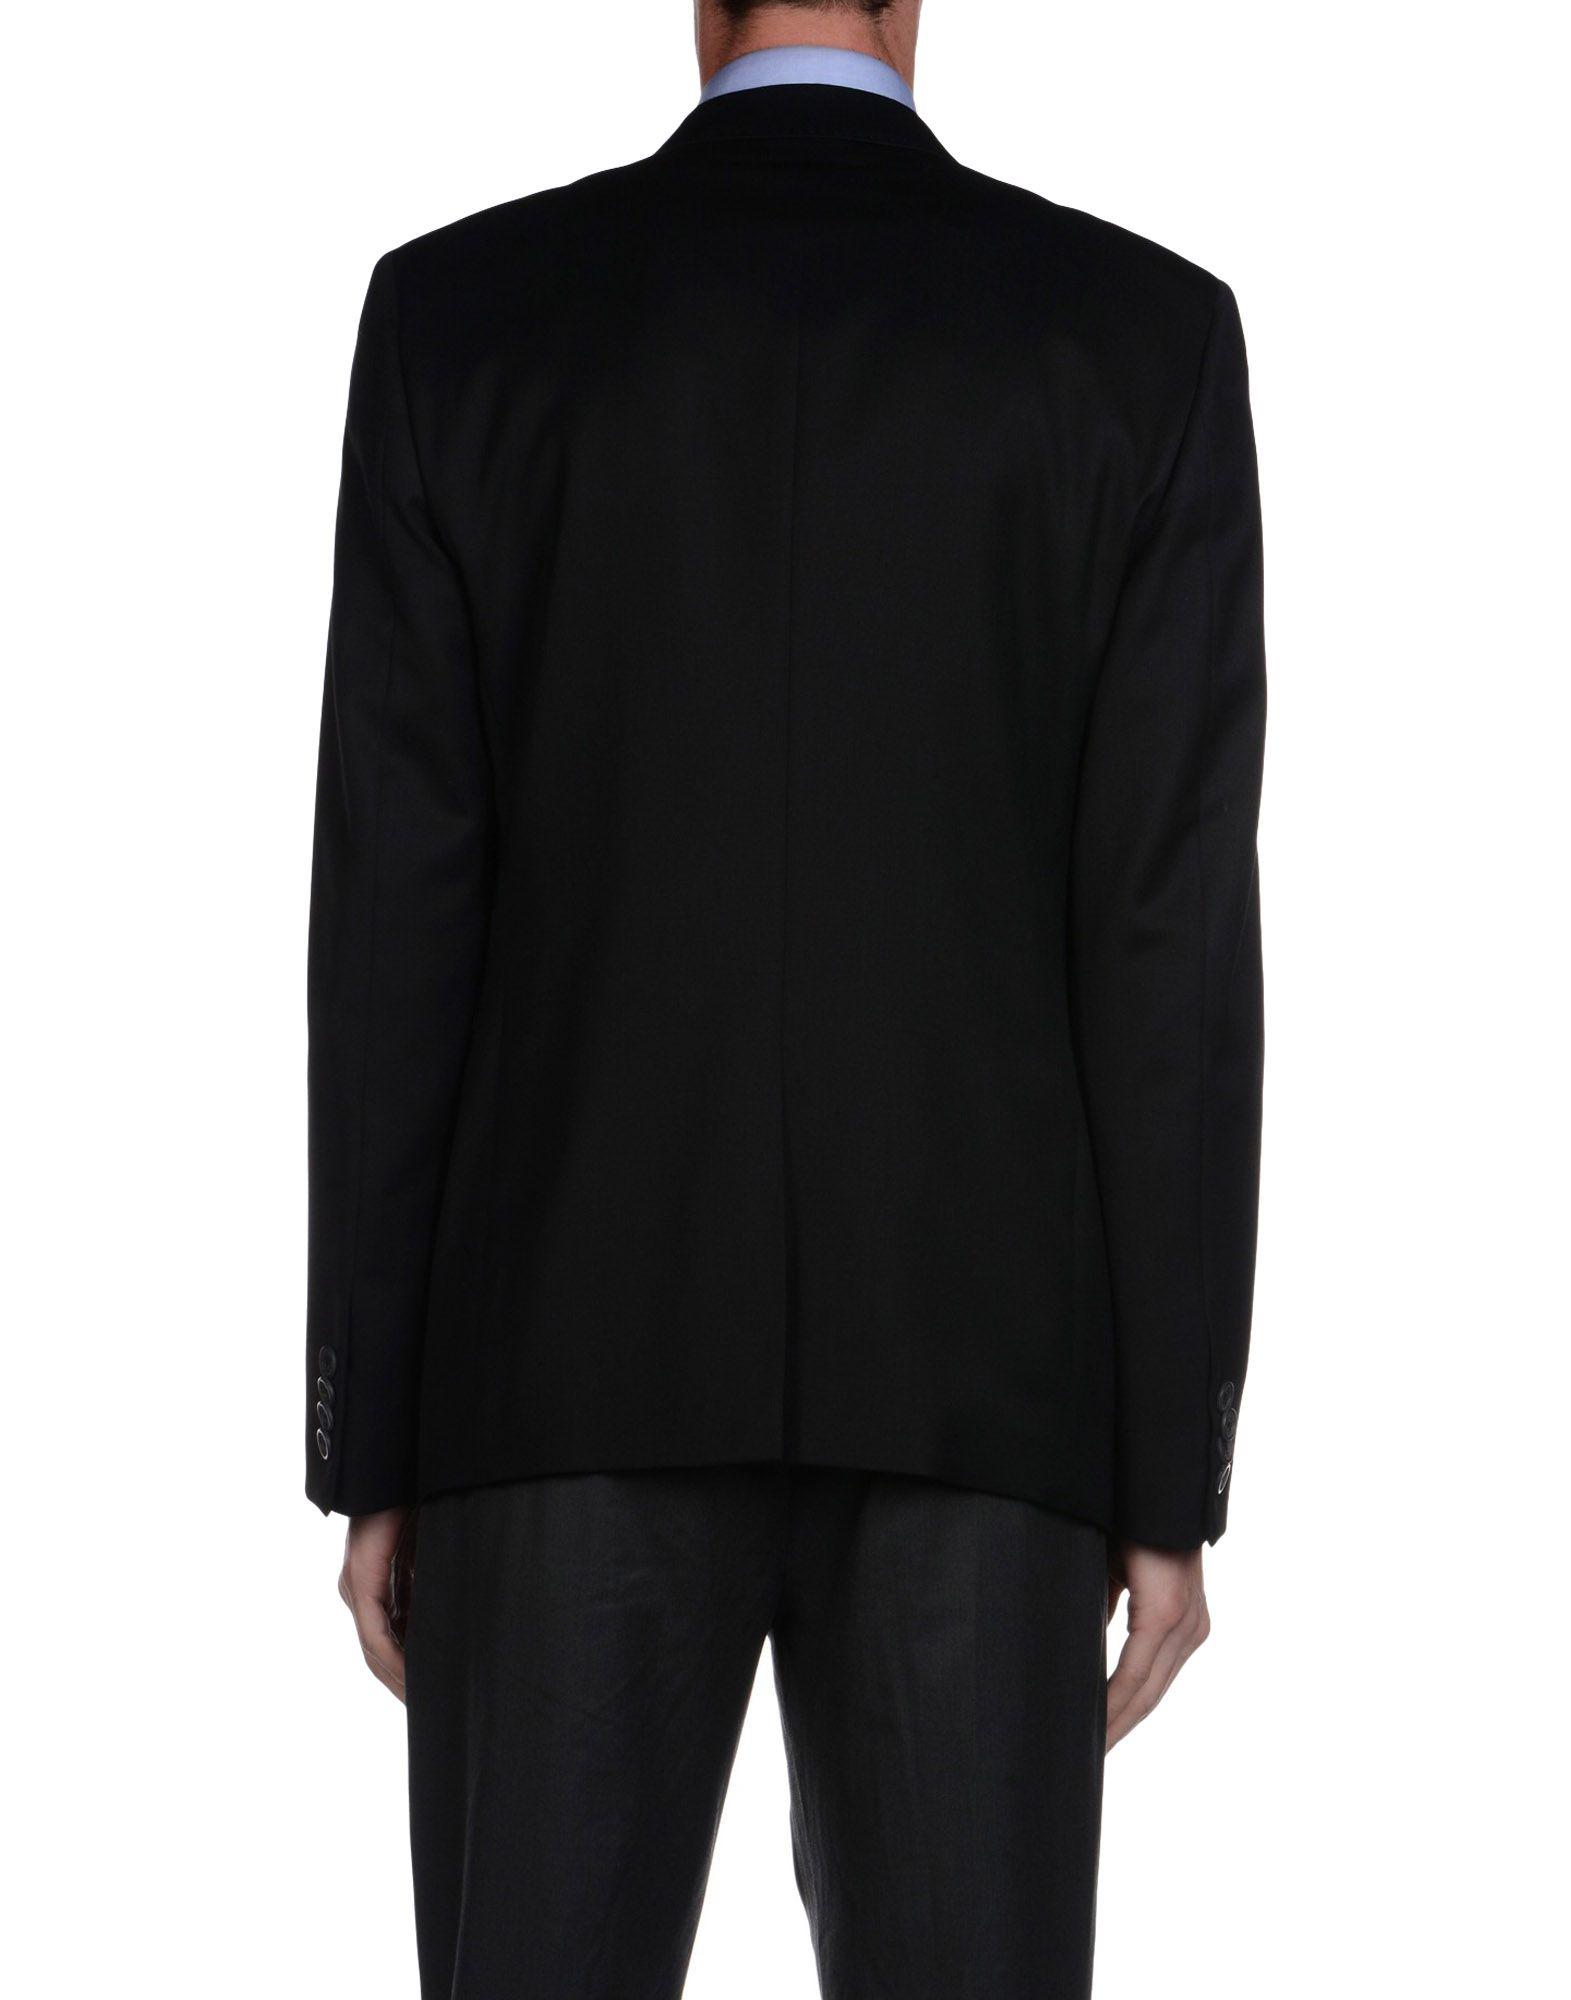 Frankie Morello Wool Blazer in Black for Men